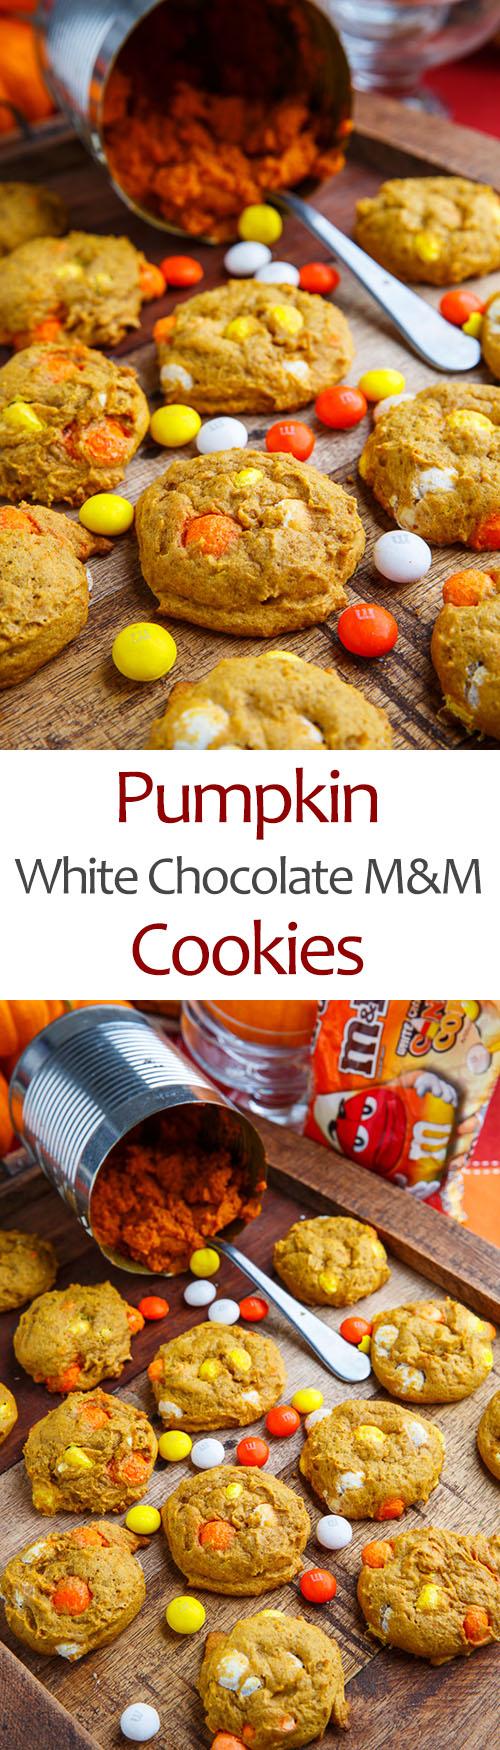 Pumpkin White Chocolate M&M Cookies